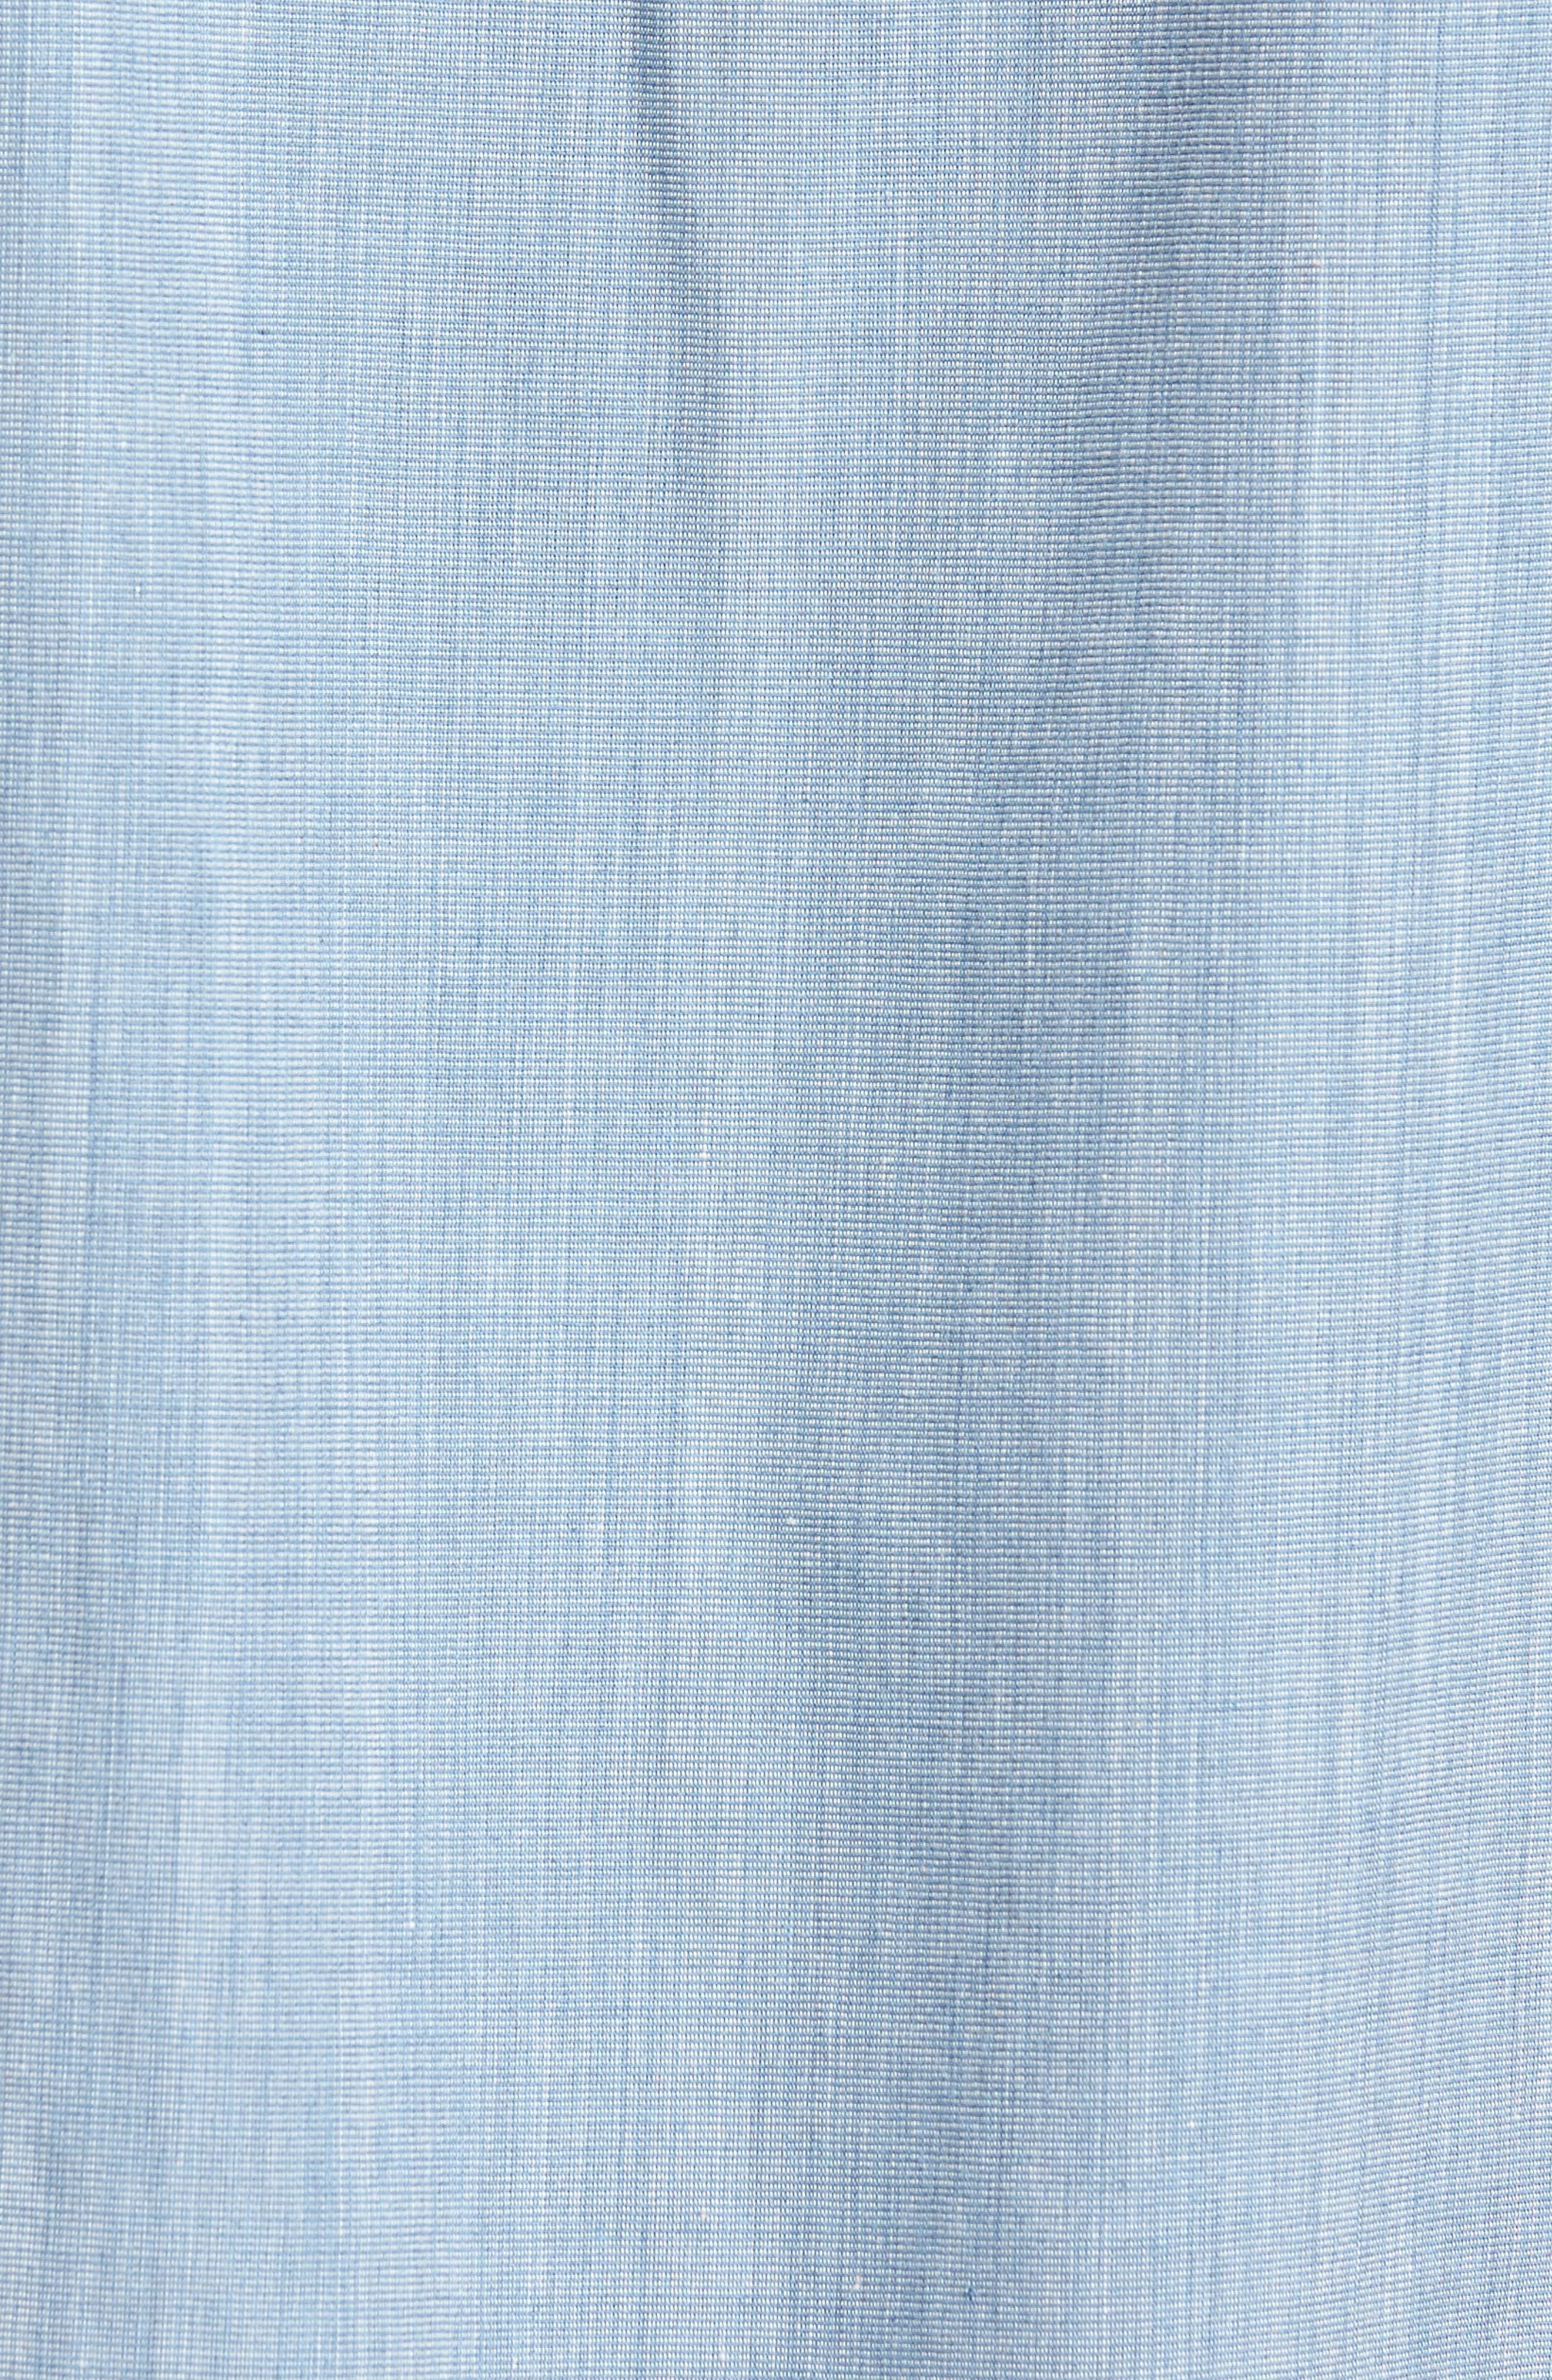 Cruze Woven Shirt,                             Alternate thumbnail 5, color,                             LIGHT BLUE